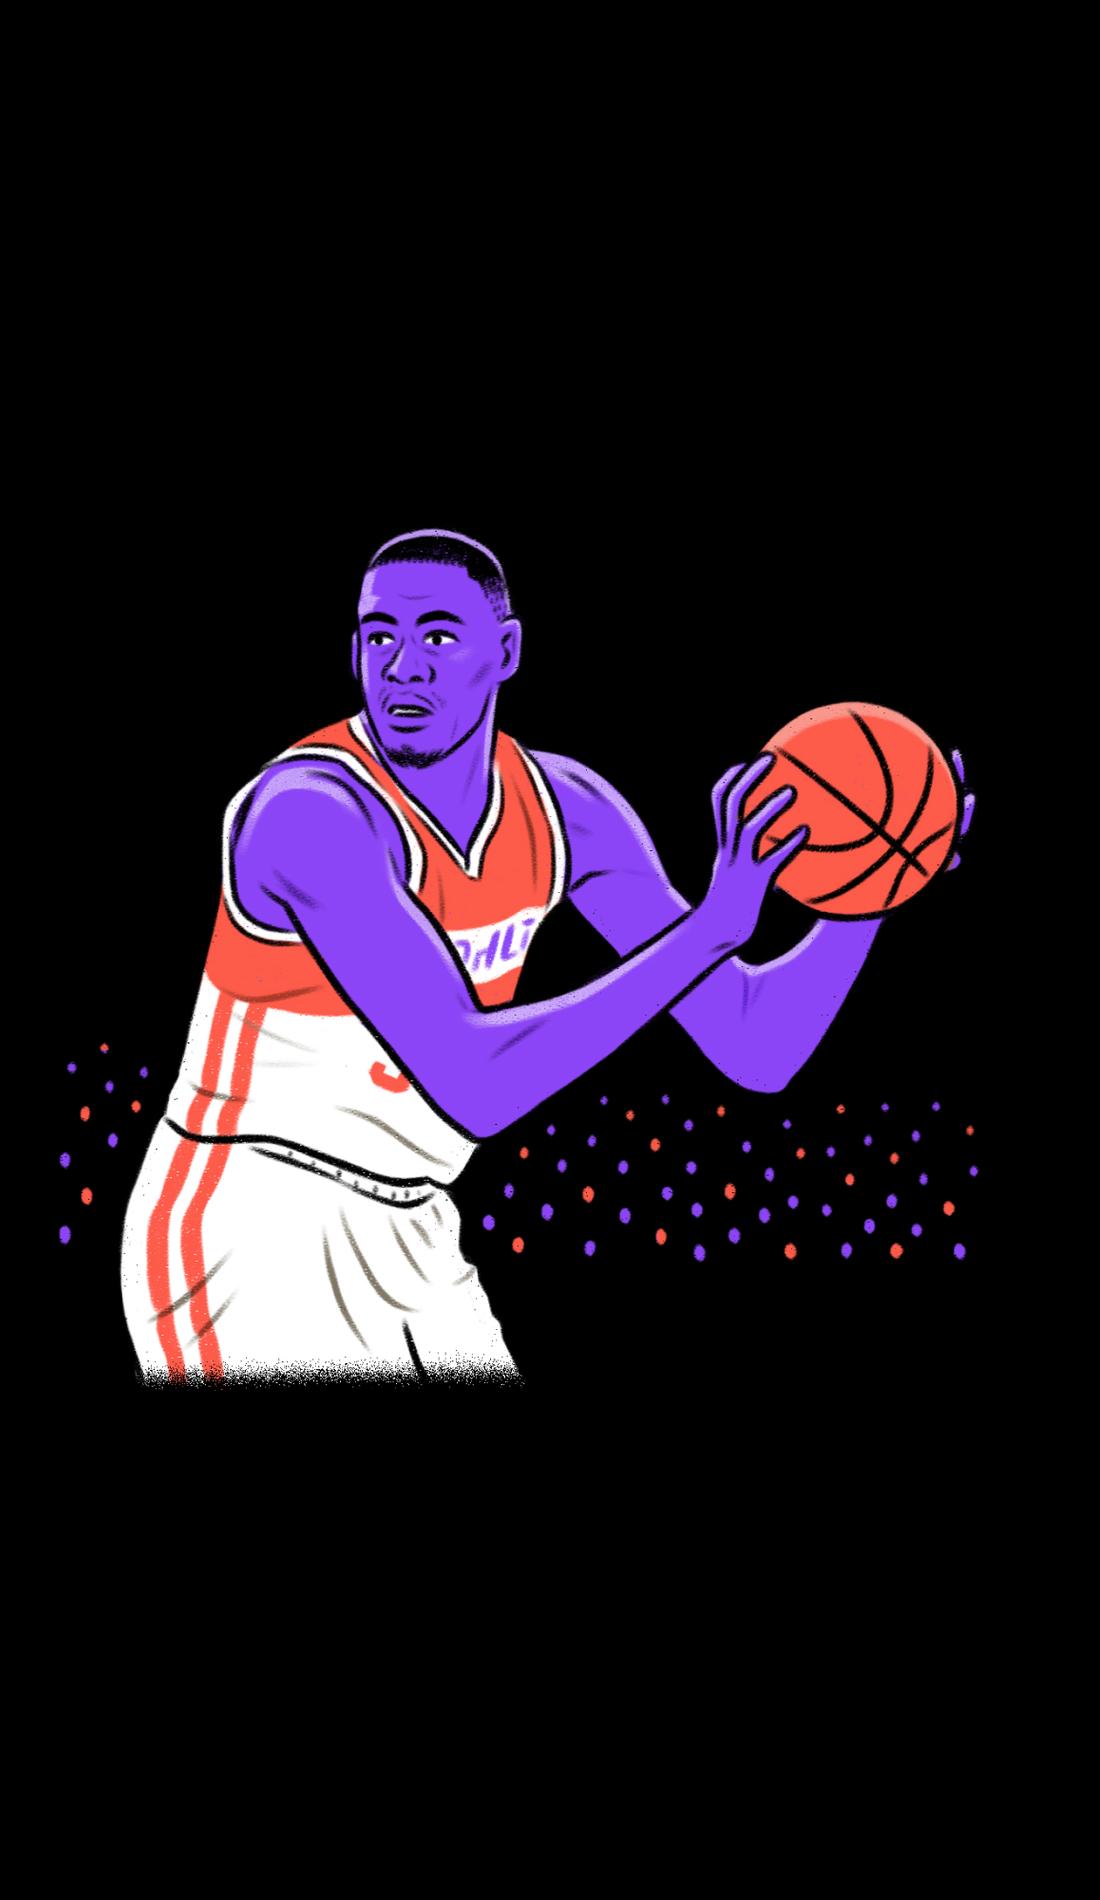 A Quinnipiac Bobcats Basketball live event